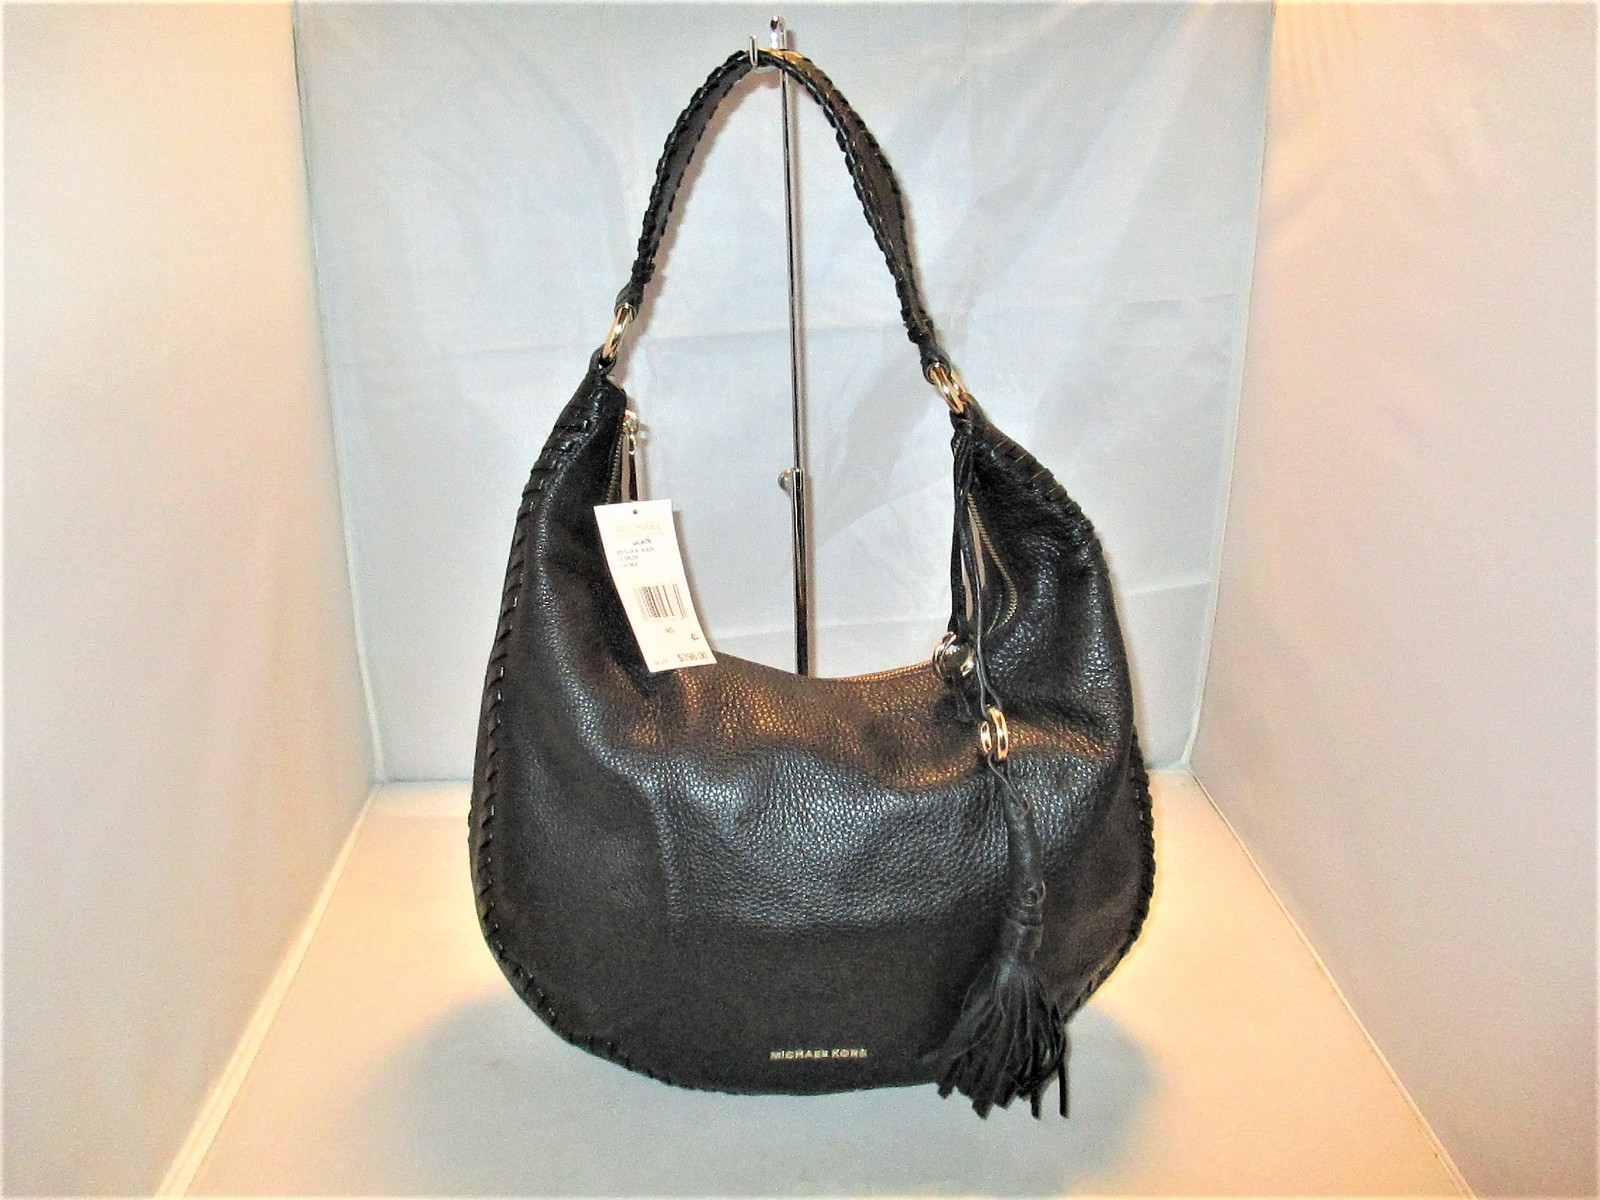 a733de28882e27 Michael Kors Handbag Lauryn Large Leather and 50 similar items. Img 4398